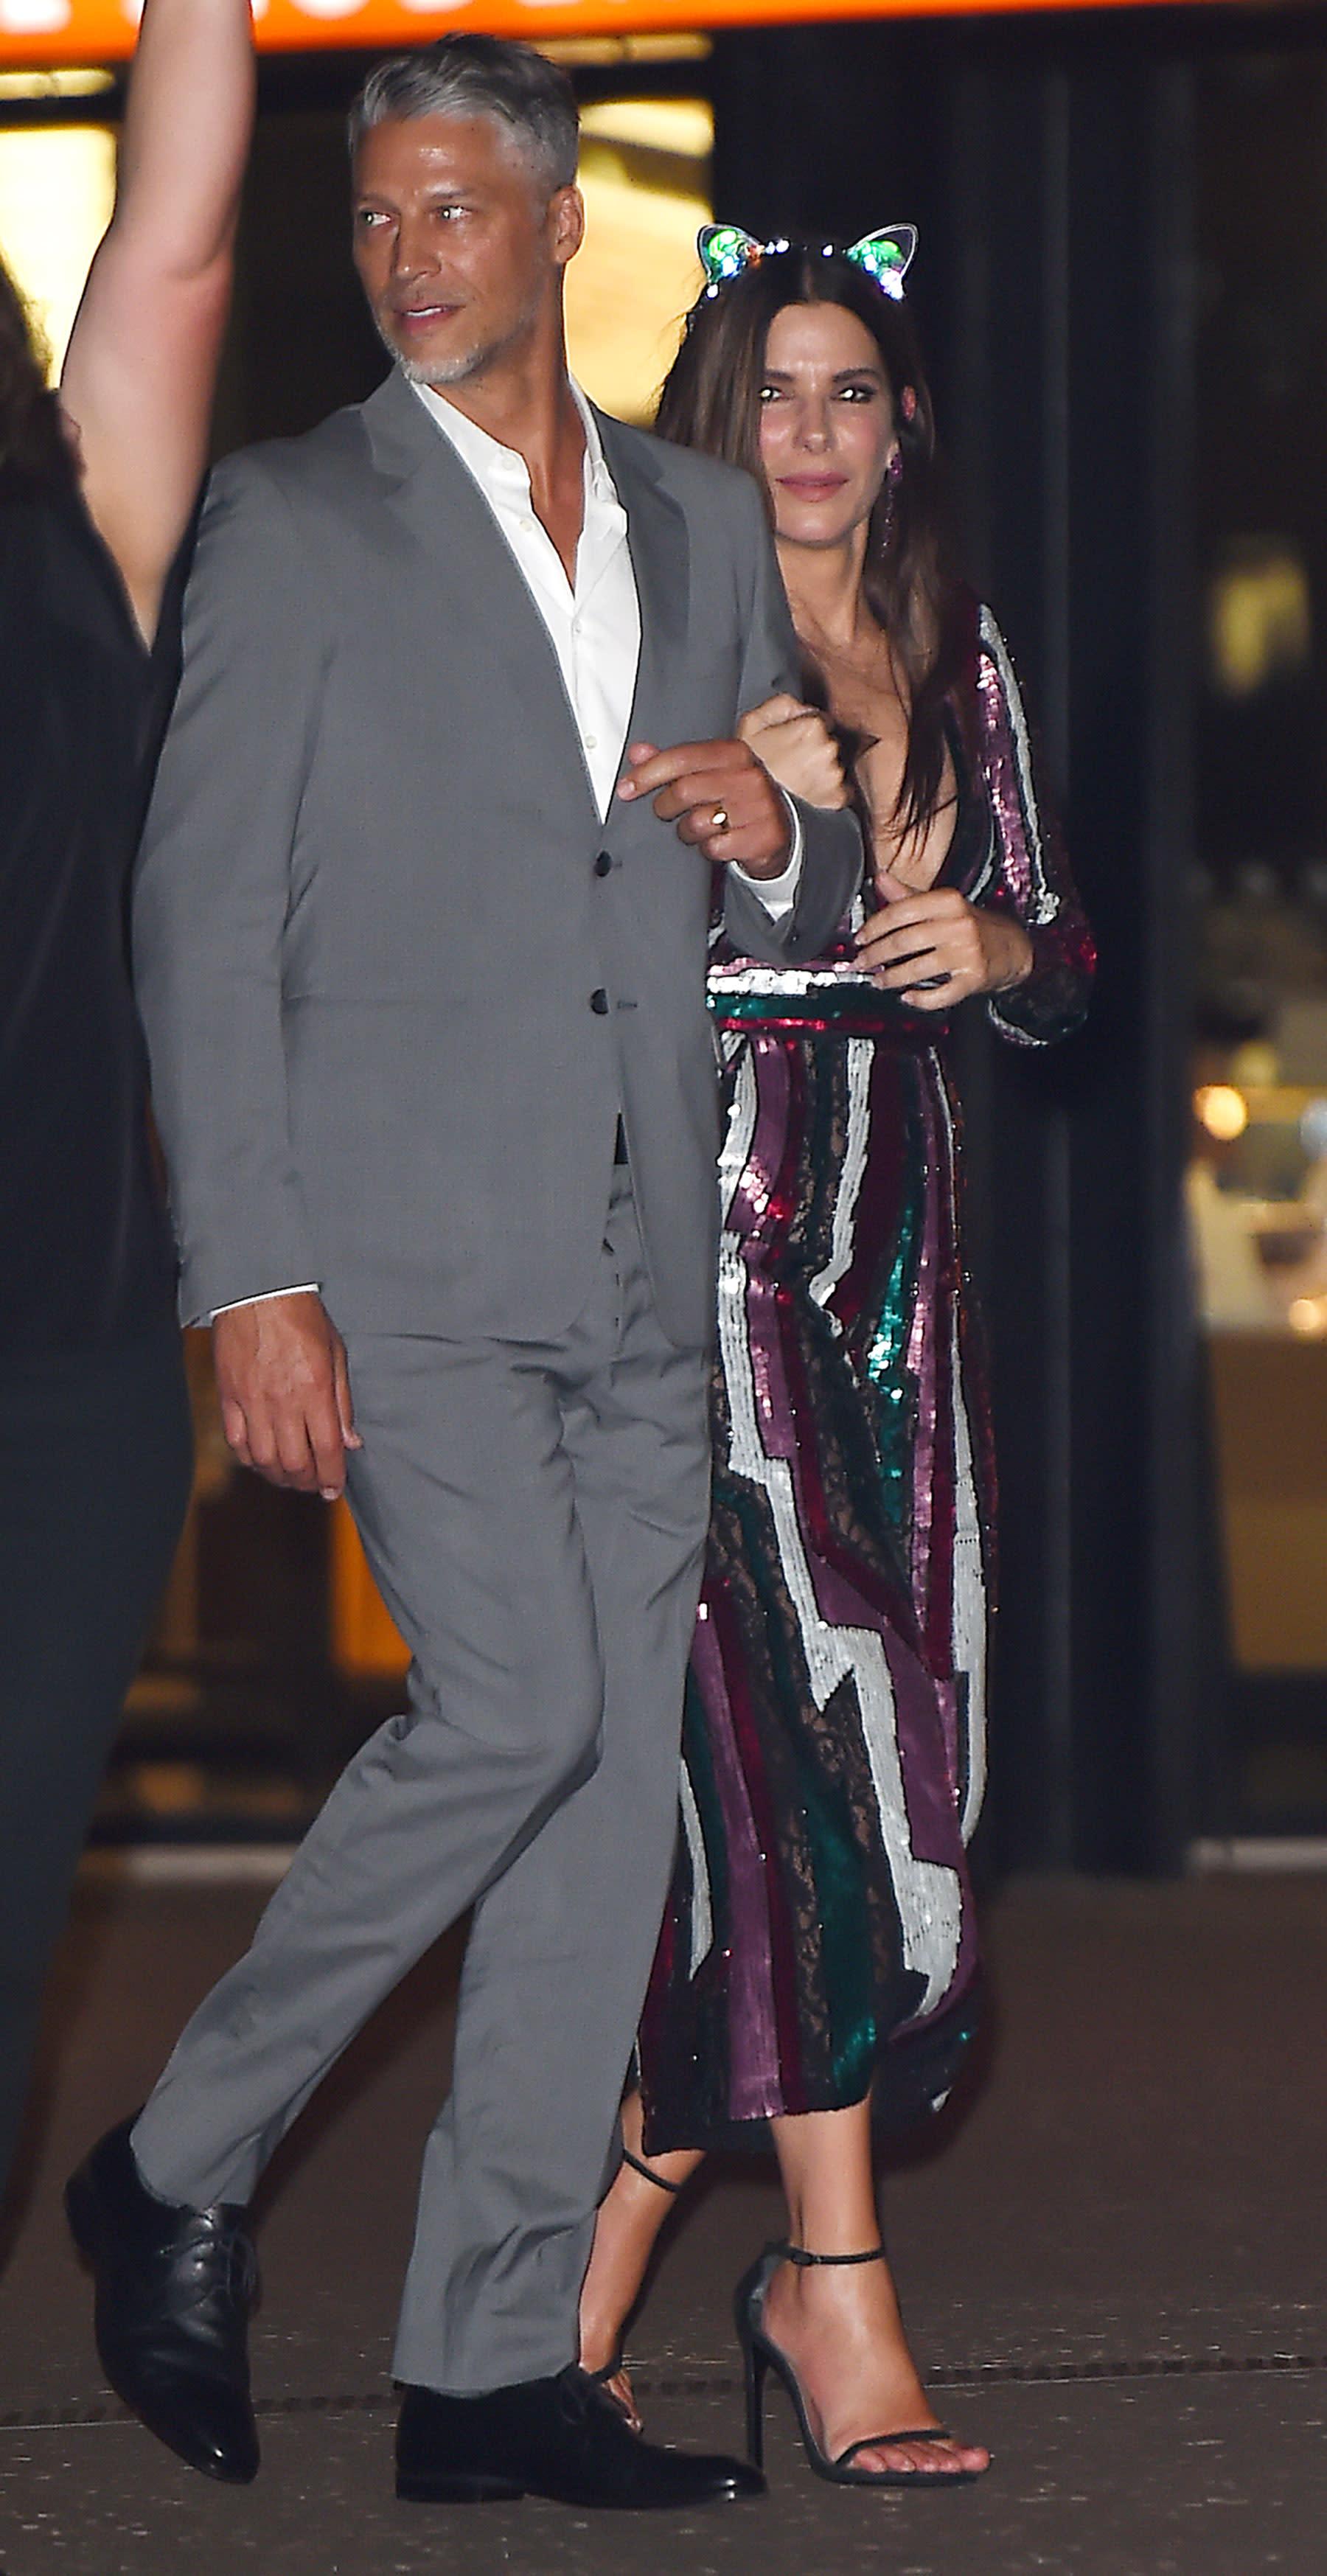 Sandra bullock son is Sandra Bullock's